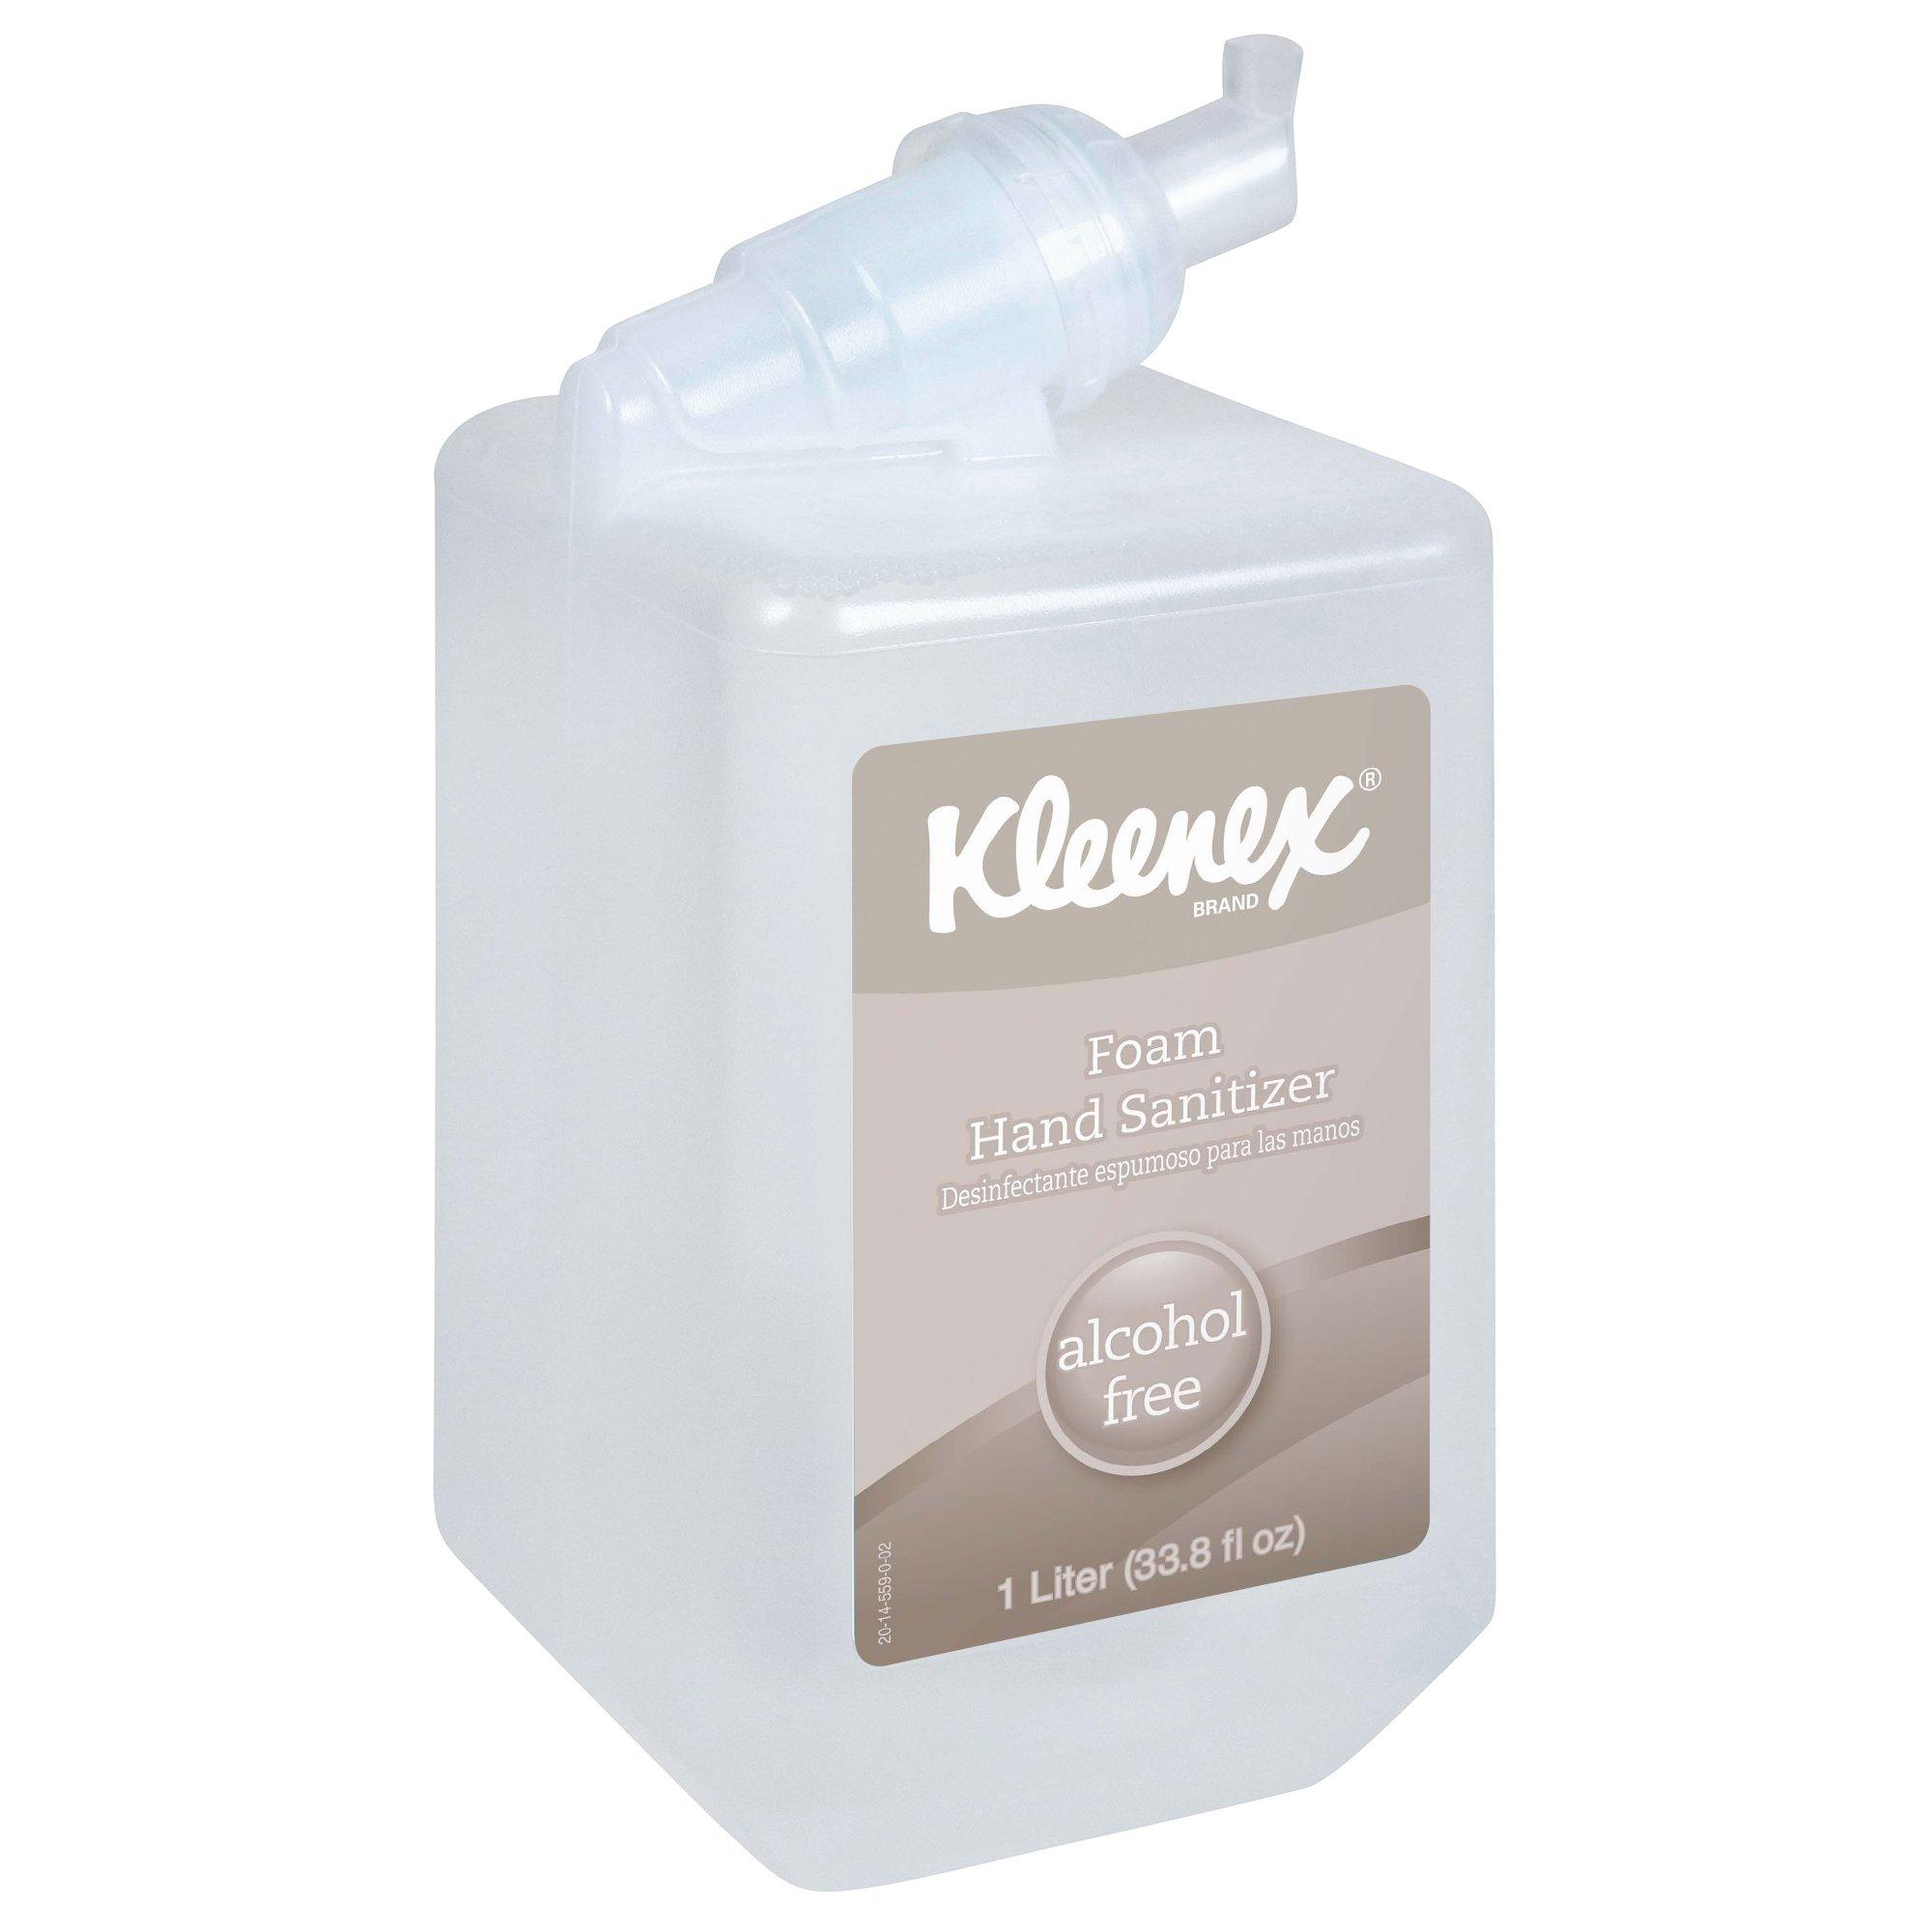 Kleenex Alcohol Free Foam Hand Sanitizer (12977), Clear, Unscented, 1.0 L Cassette for Manual Dispenser, 6 / Case